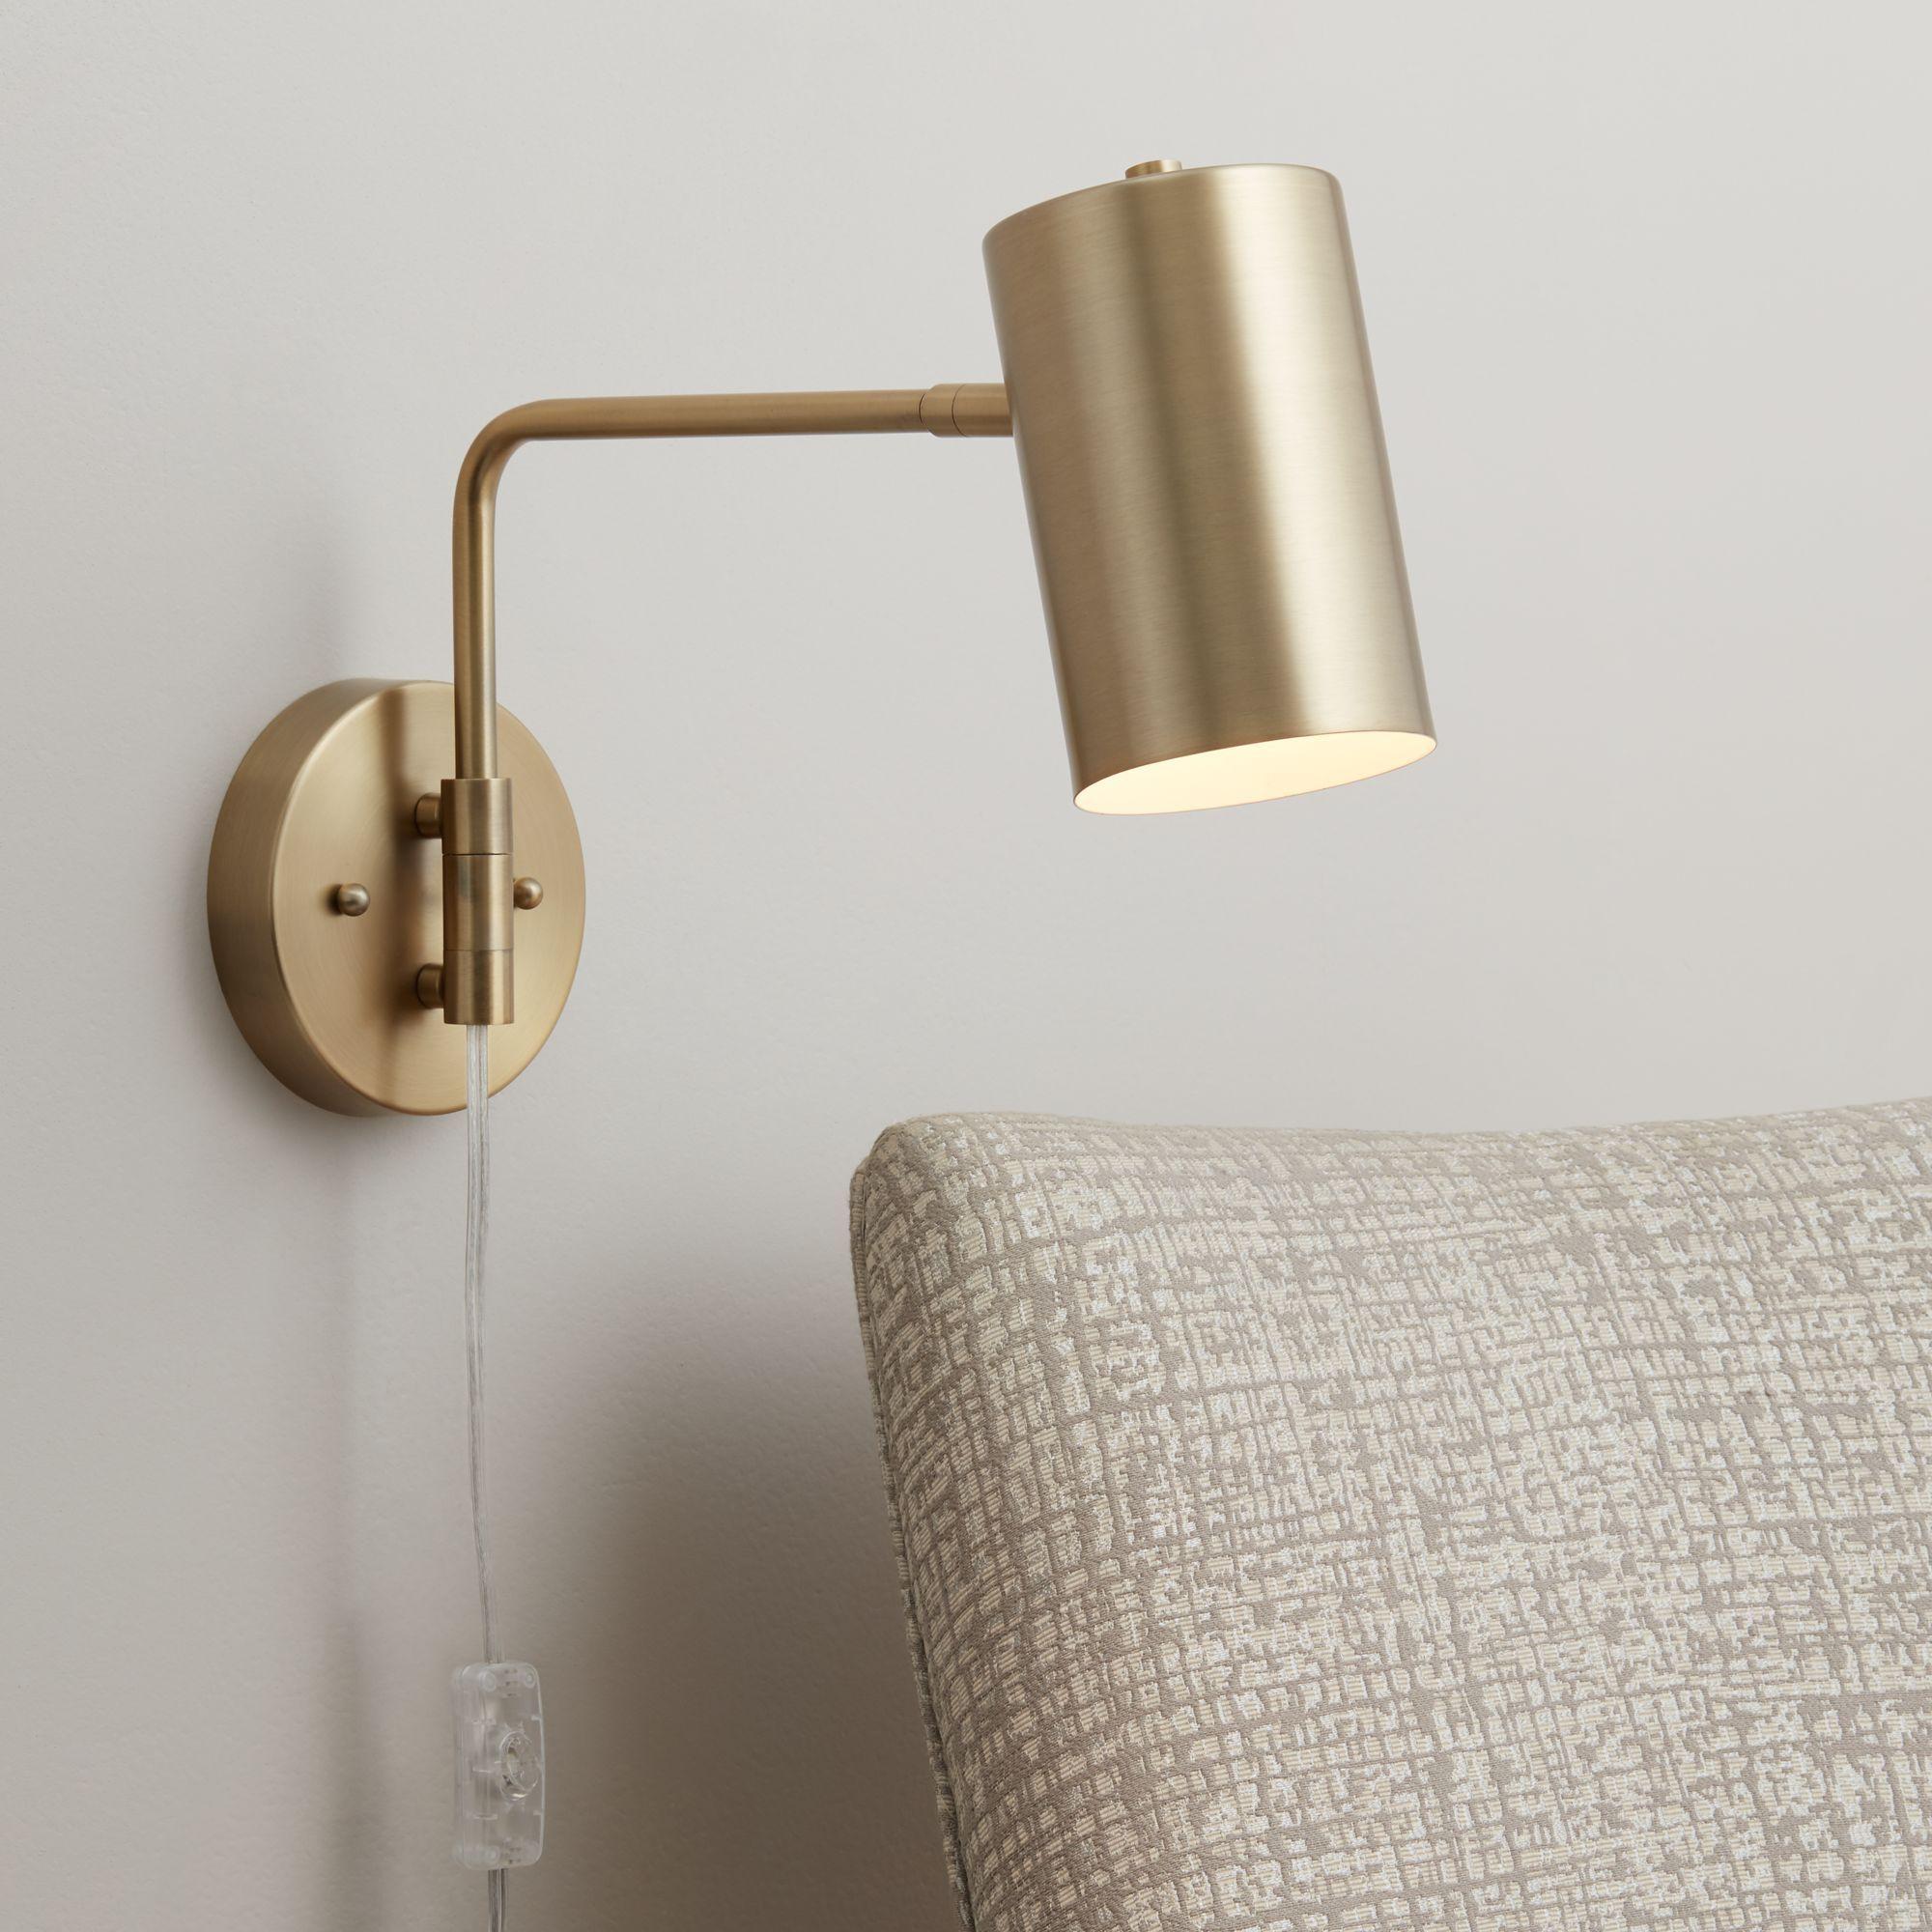 360 Lighting Carla Polished Brass Down Light Swing Arm Wall Lamp Walmart Com Swing Arm Wall Lamps Wall Lamps Bedroom Plug In Wall Sconce